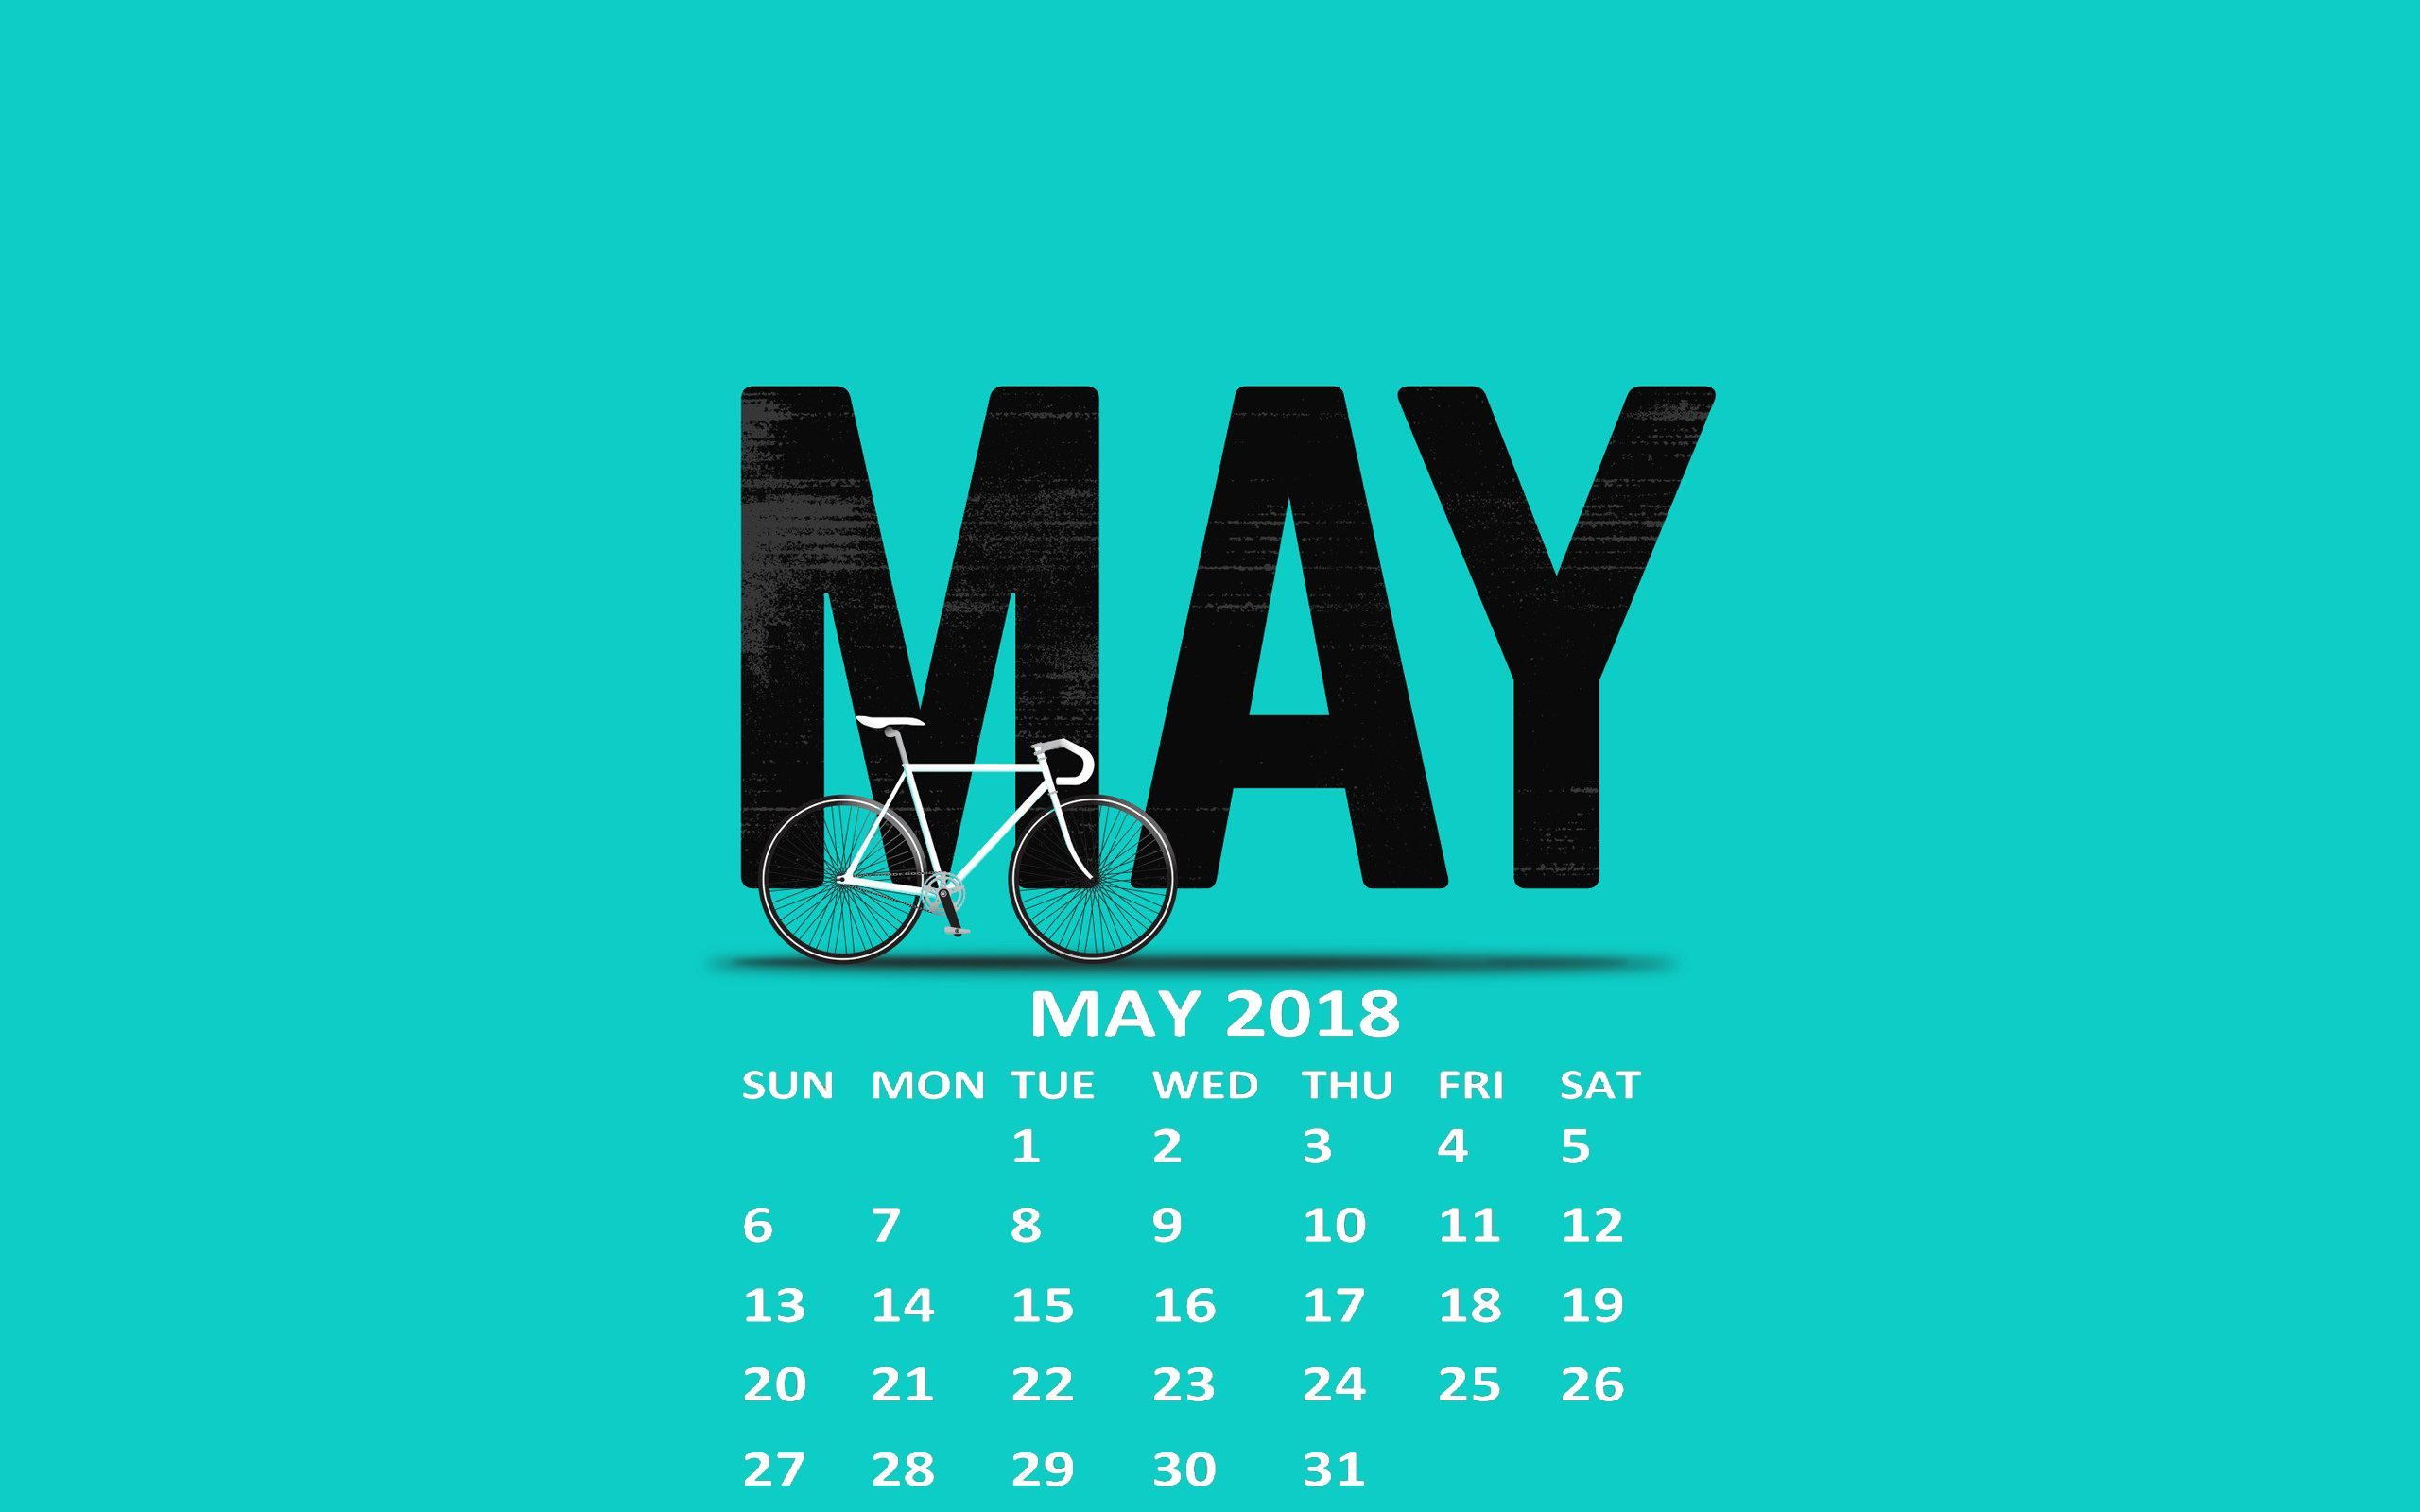 May 2018 Calendar Wallpapers 2018 Calendars May 2018 calendar 2560x1600